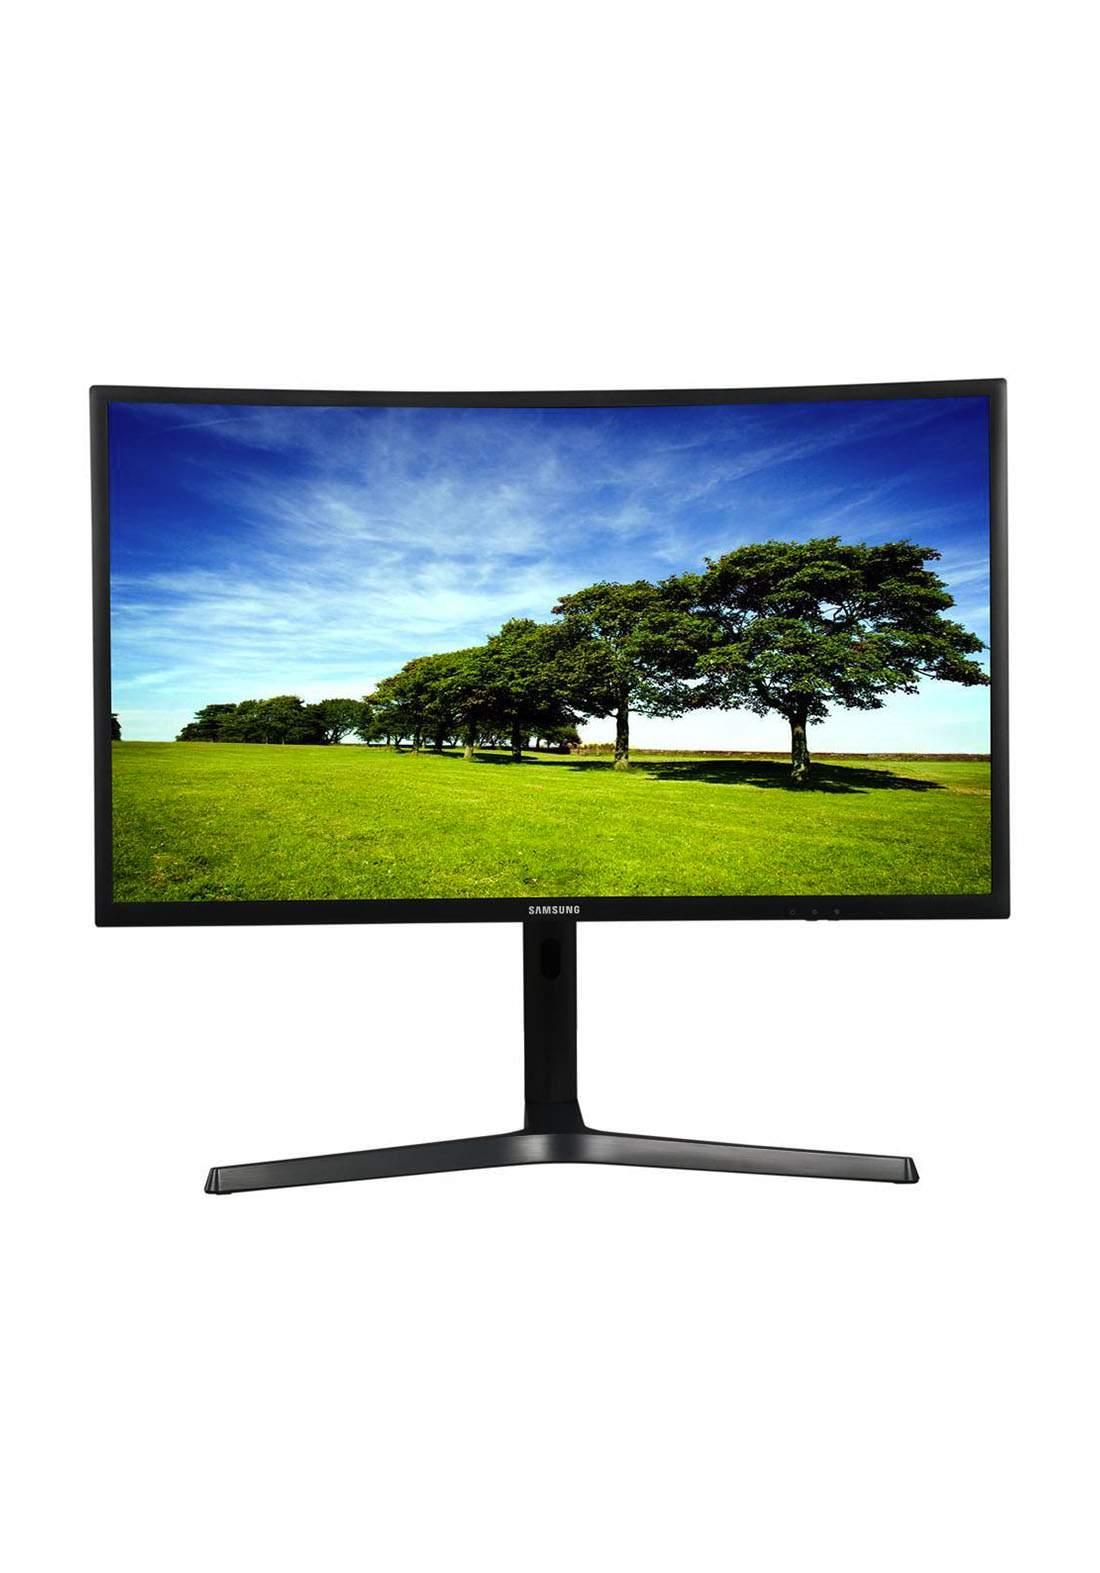 Samsung 27 Inch Cfg73 144hz 1ms Qled Curved Gaming Monitor شاشة كمبيوتر